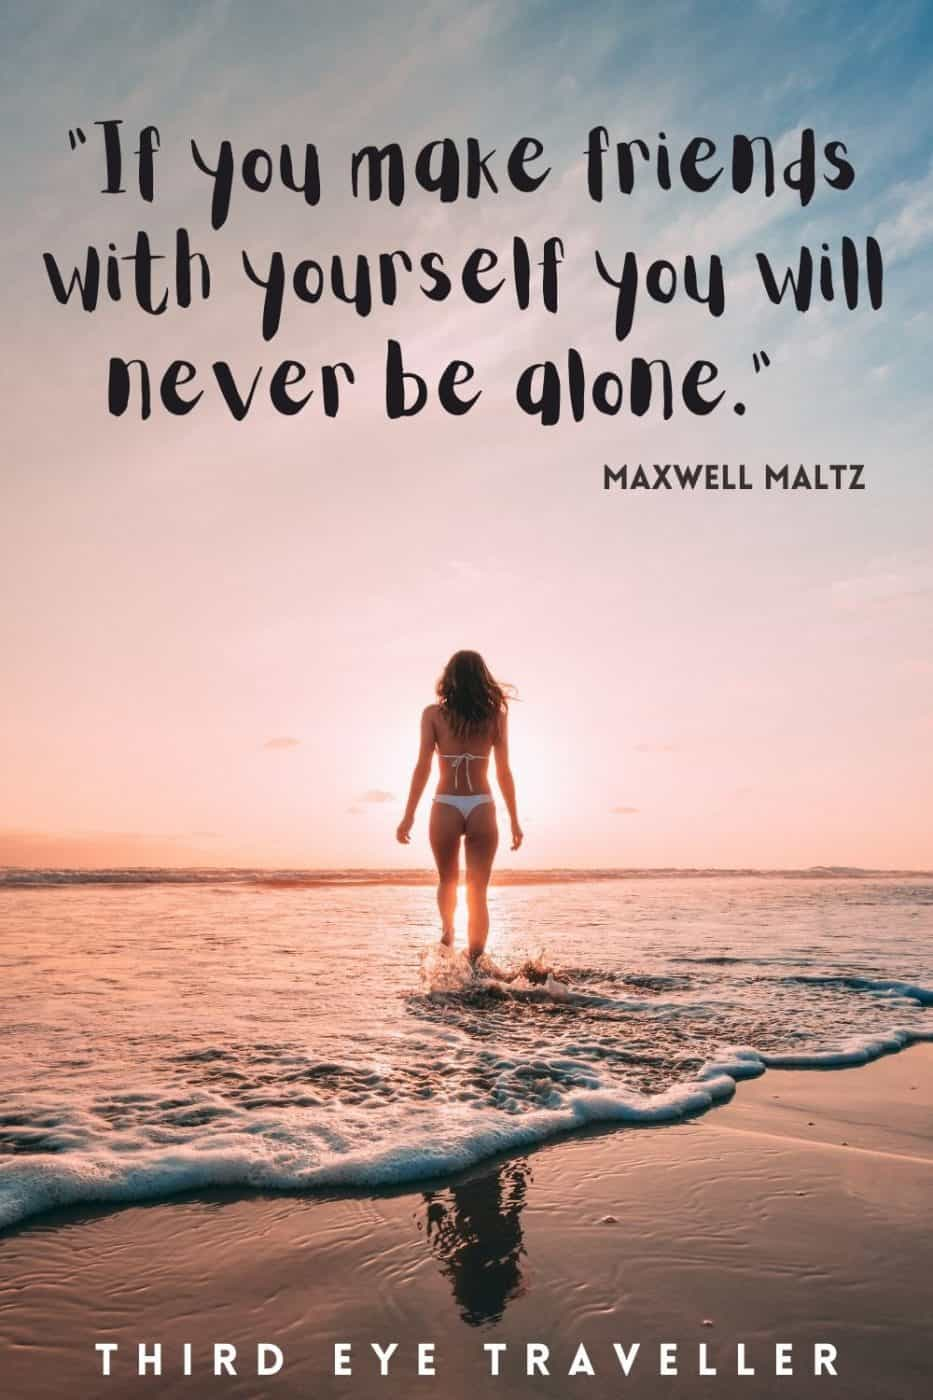 Solo travel quotes